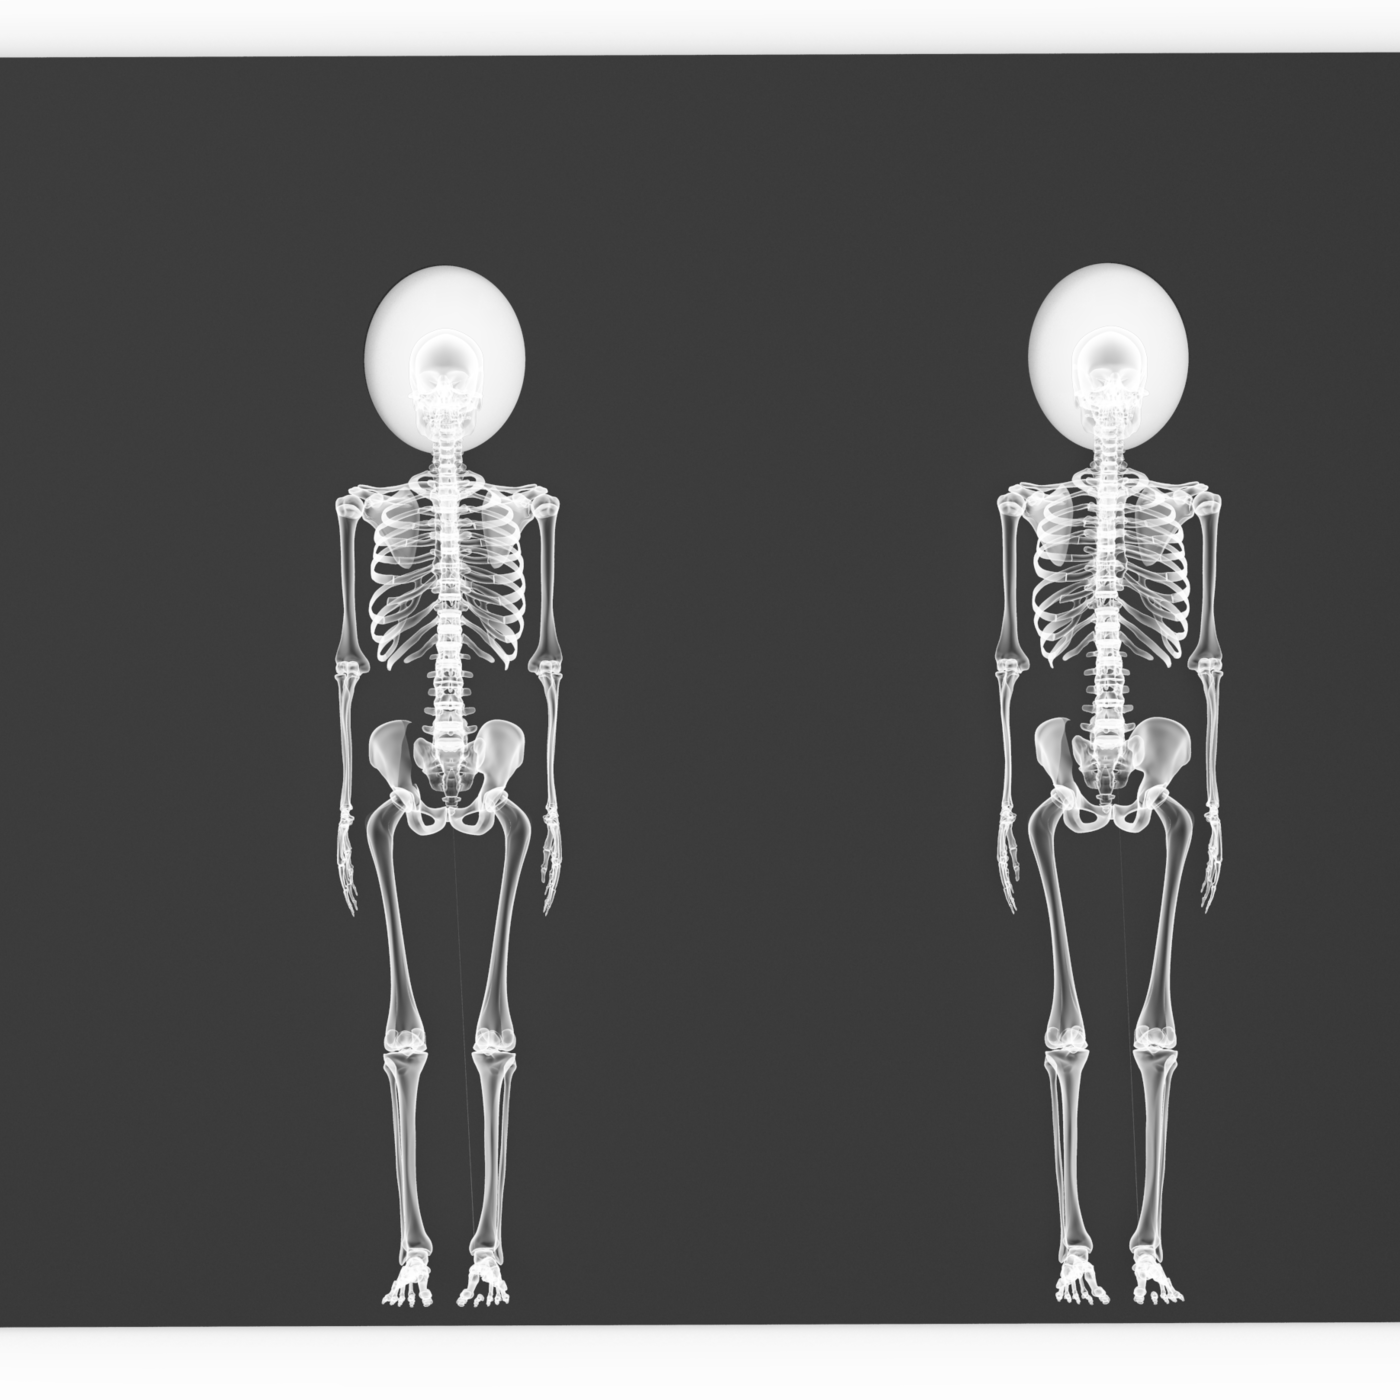 X-ray effect creation